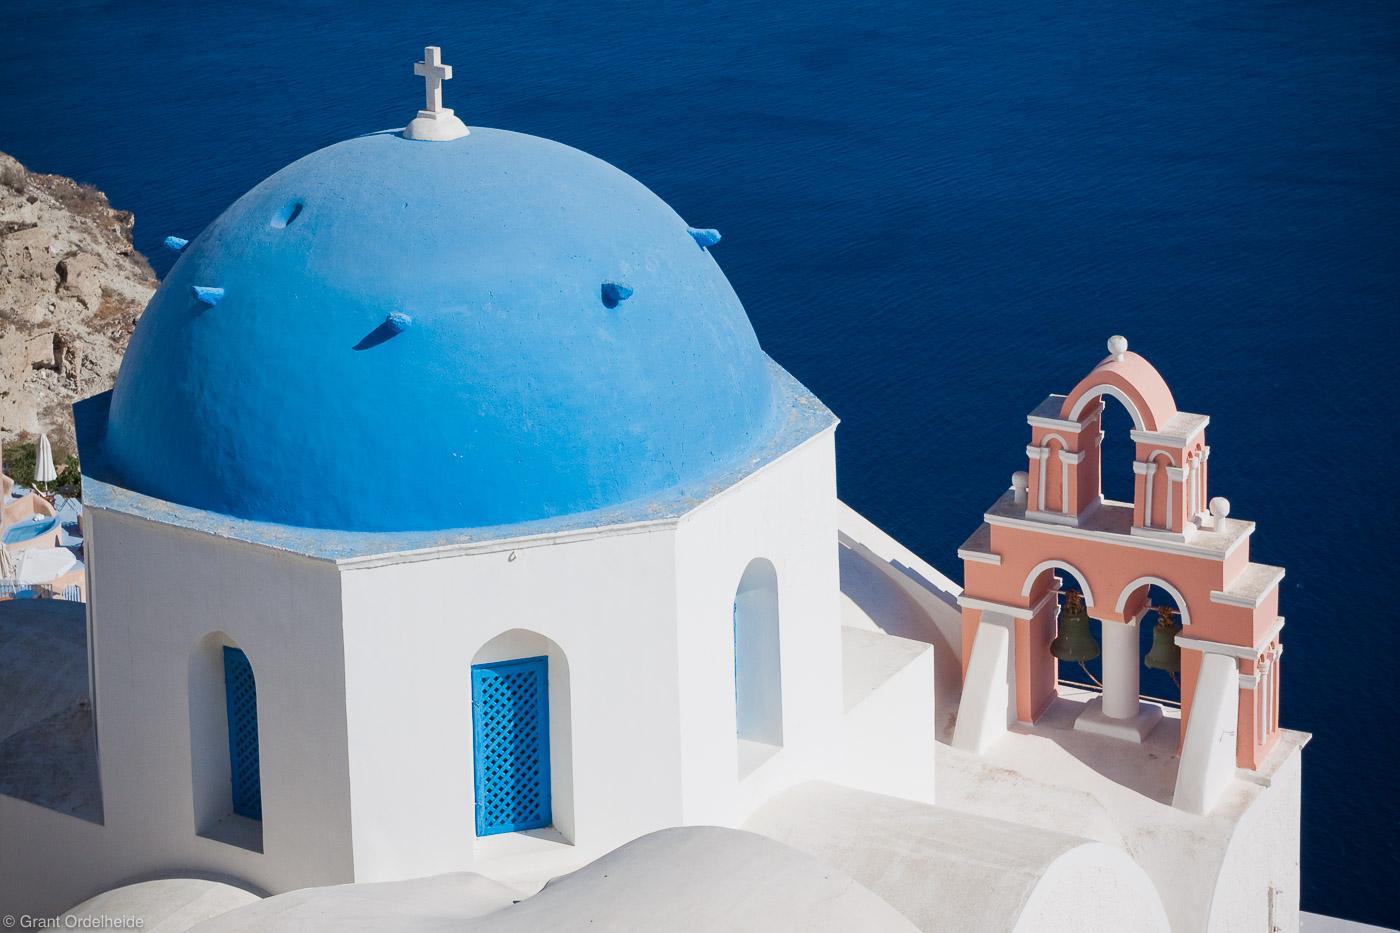 blue, sea, oia, santorini, greece, mediterranean, architecture, deep, overlooks, photo